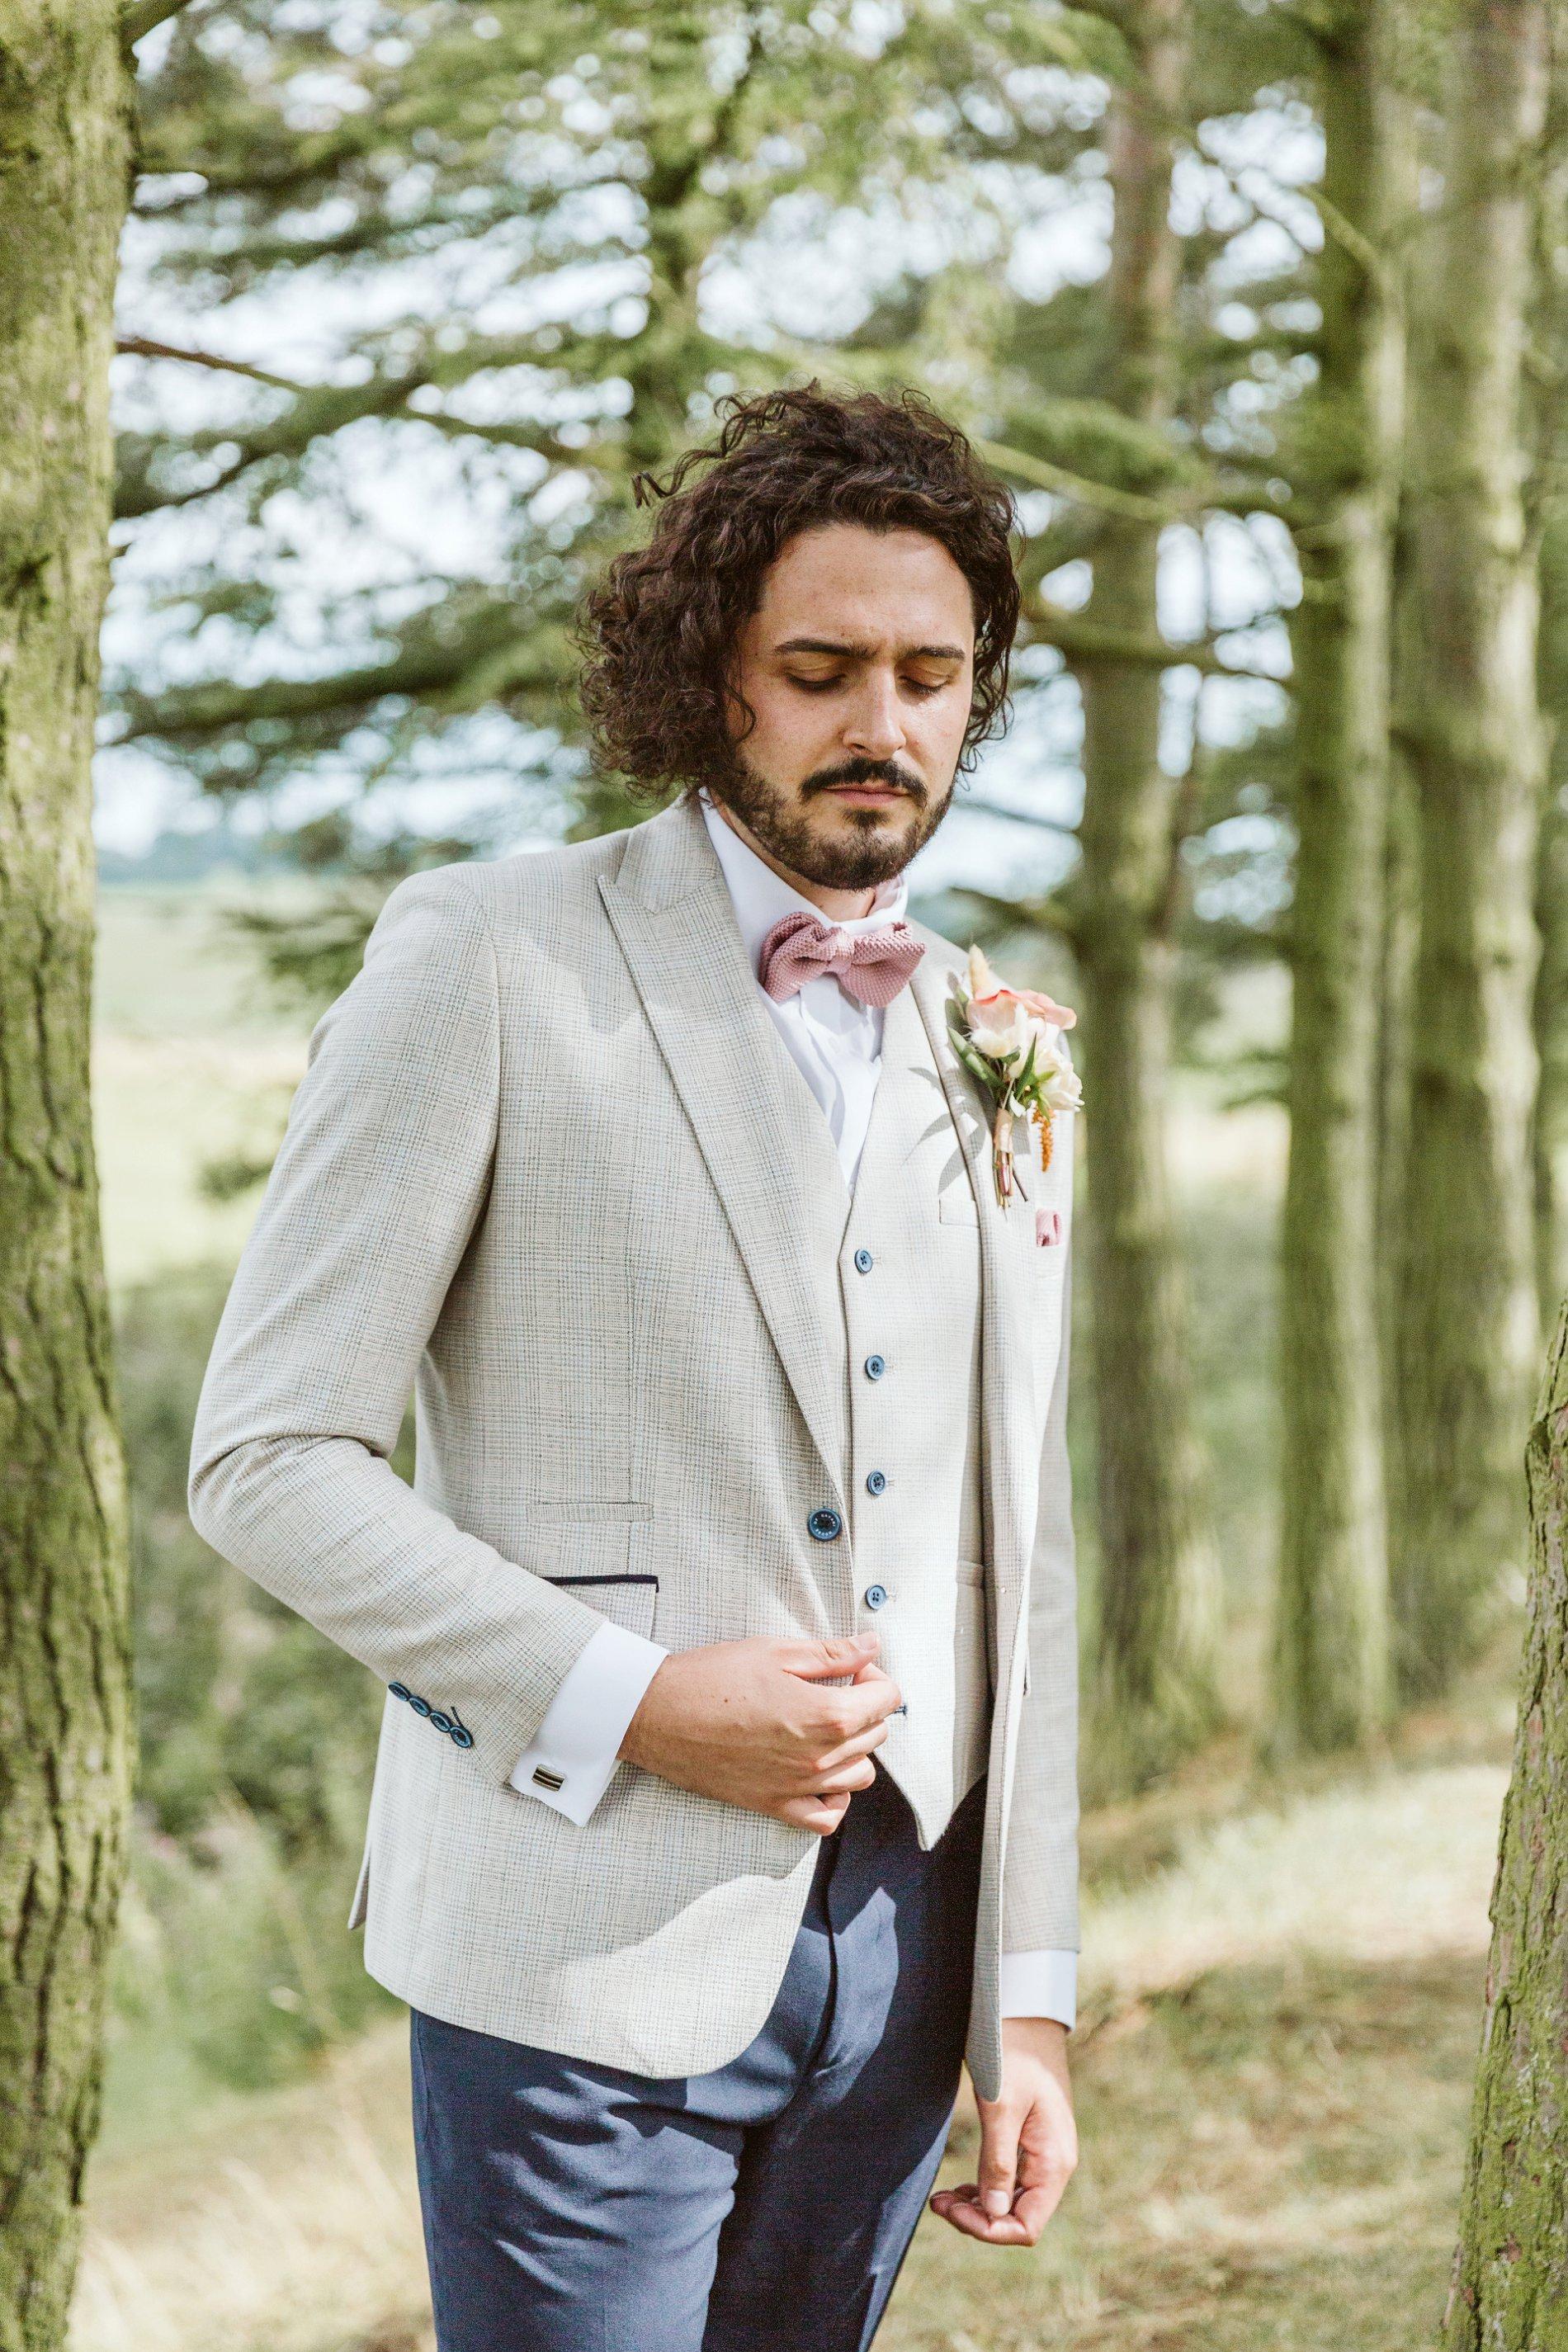 Saying I Do Rustic Wedding Creative Shoot (c) Charlotte Eve Photography (6)